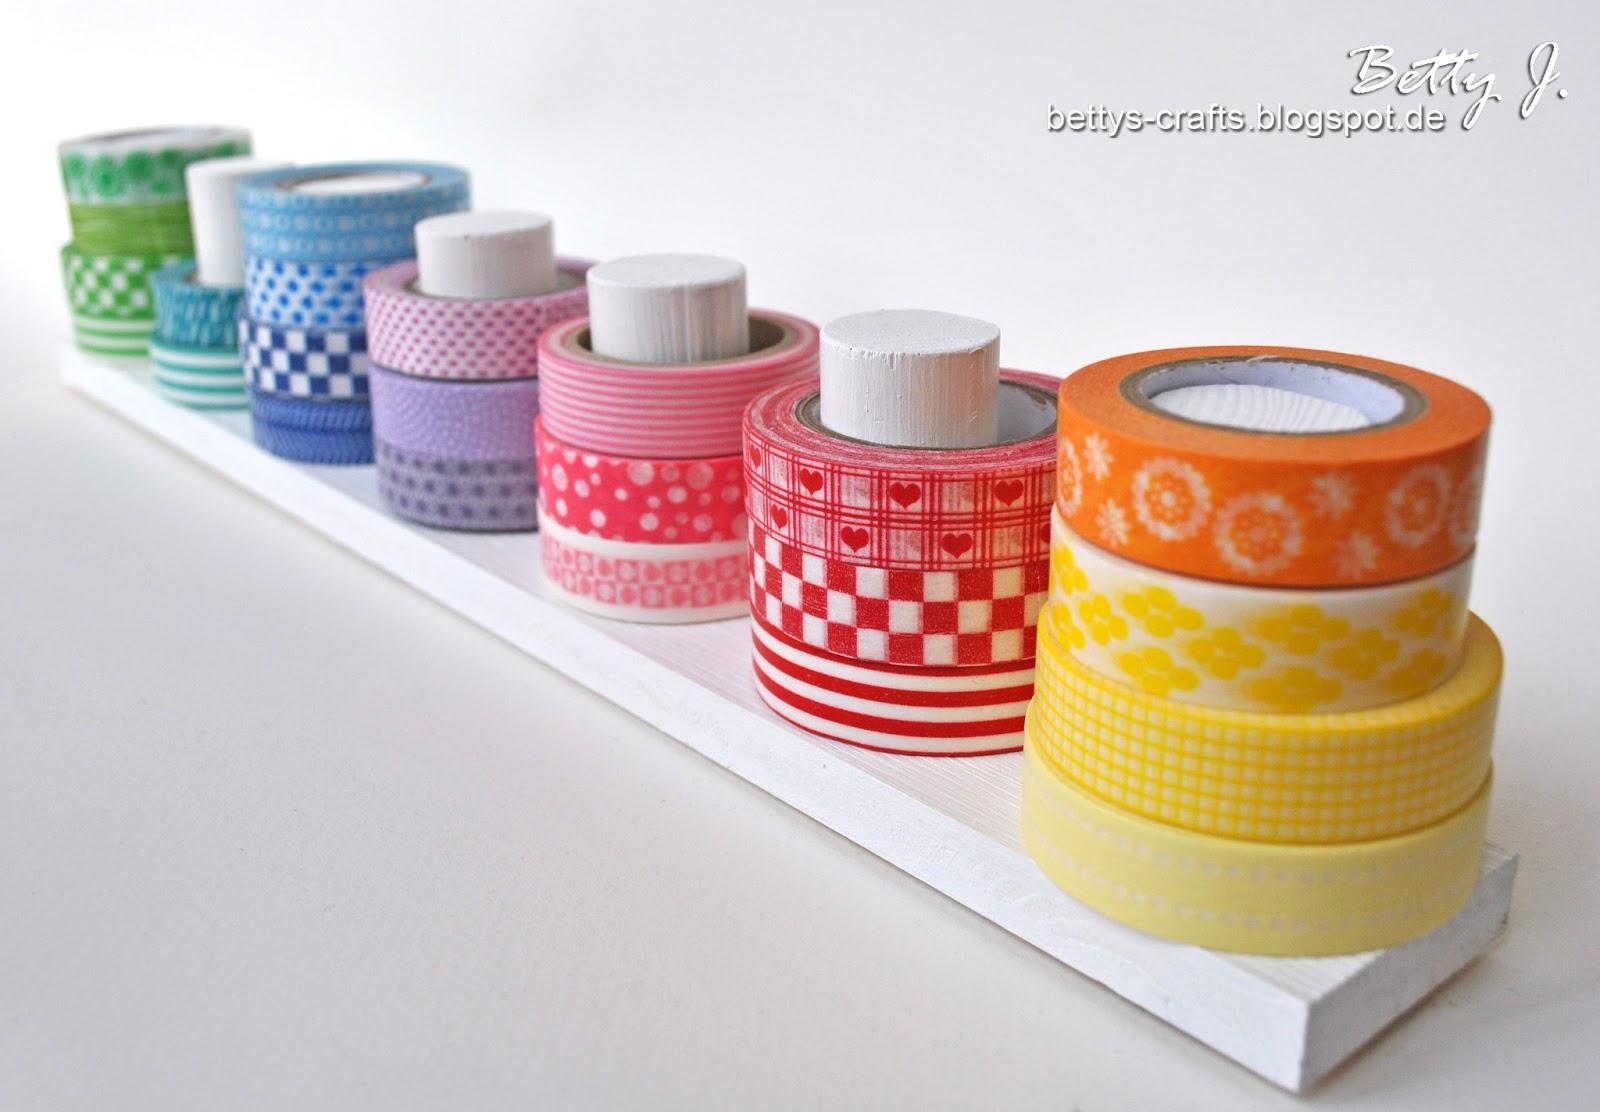 bettys crafts washi tape st nder. Black Bedroom Furniture Sets. Home Design Ideas